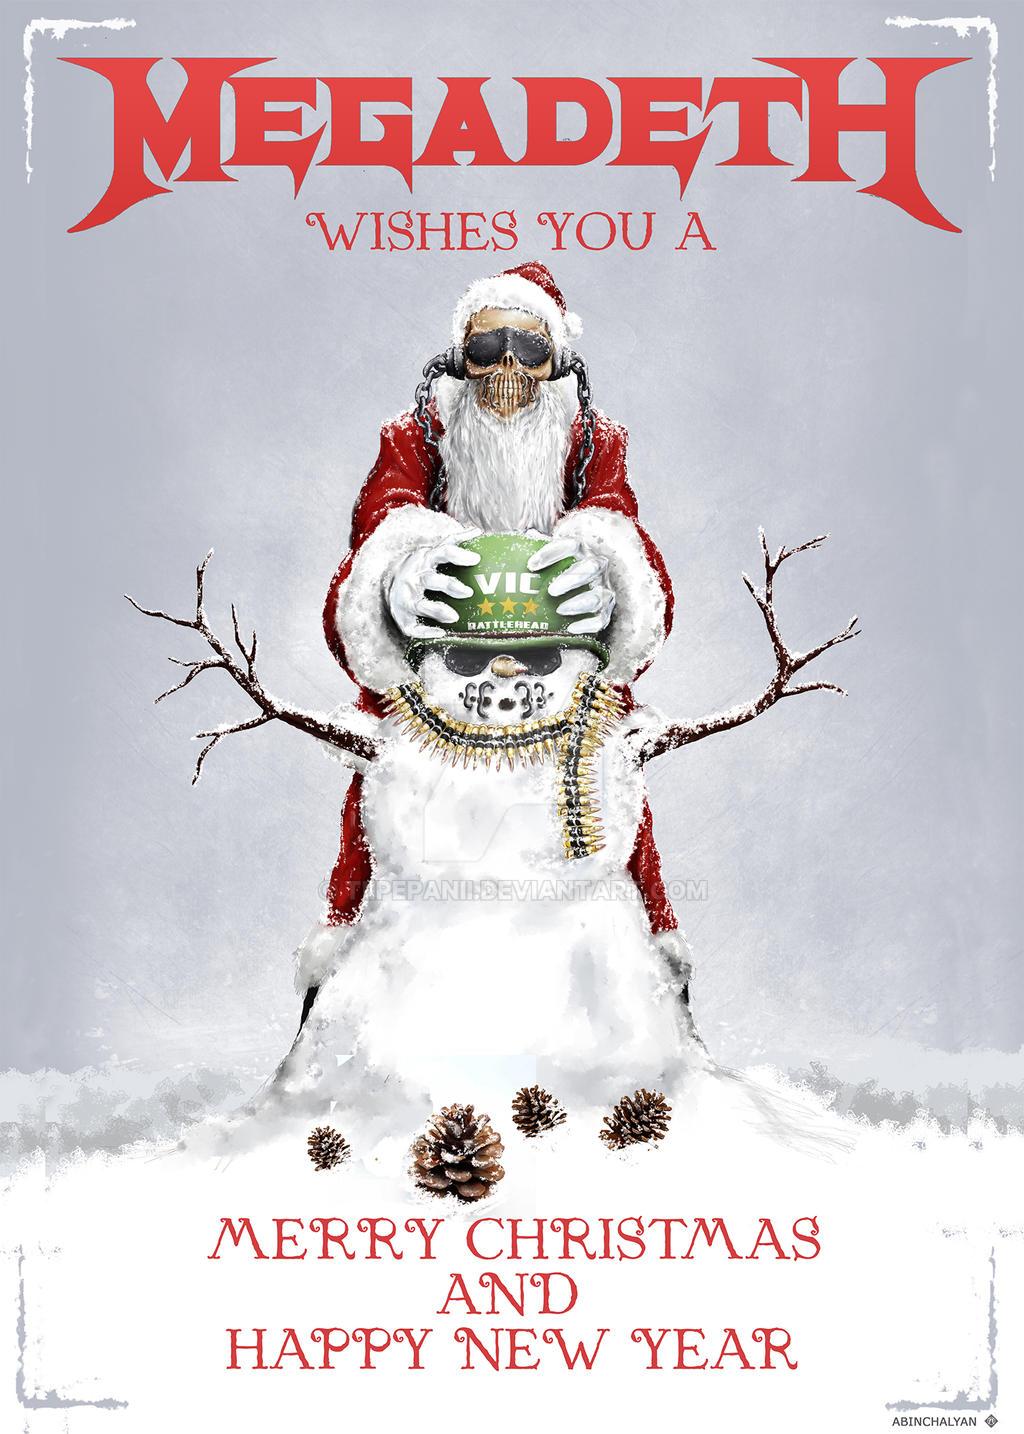 http://img11.deviantart.net/c376/i/2015/105/a/1/megadeth_christmas_card_concept_02_by_tiipepanii-d8b29m0.jpg